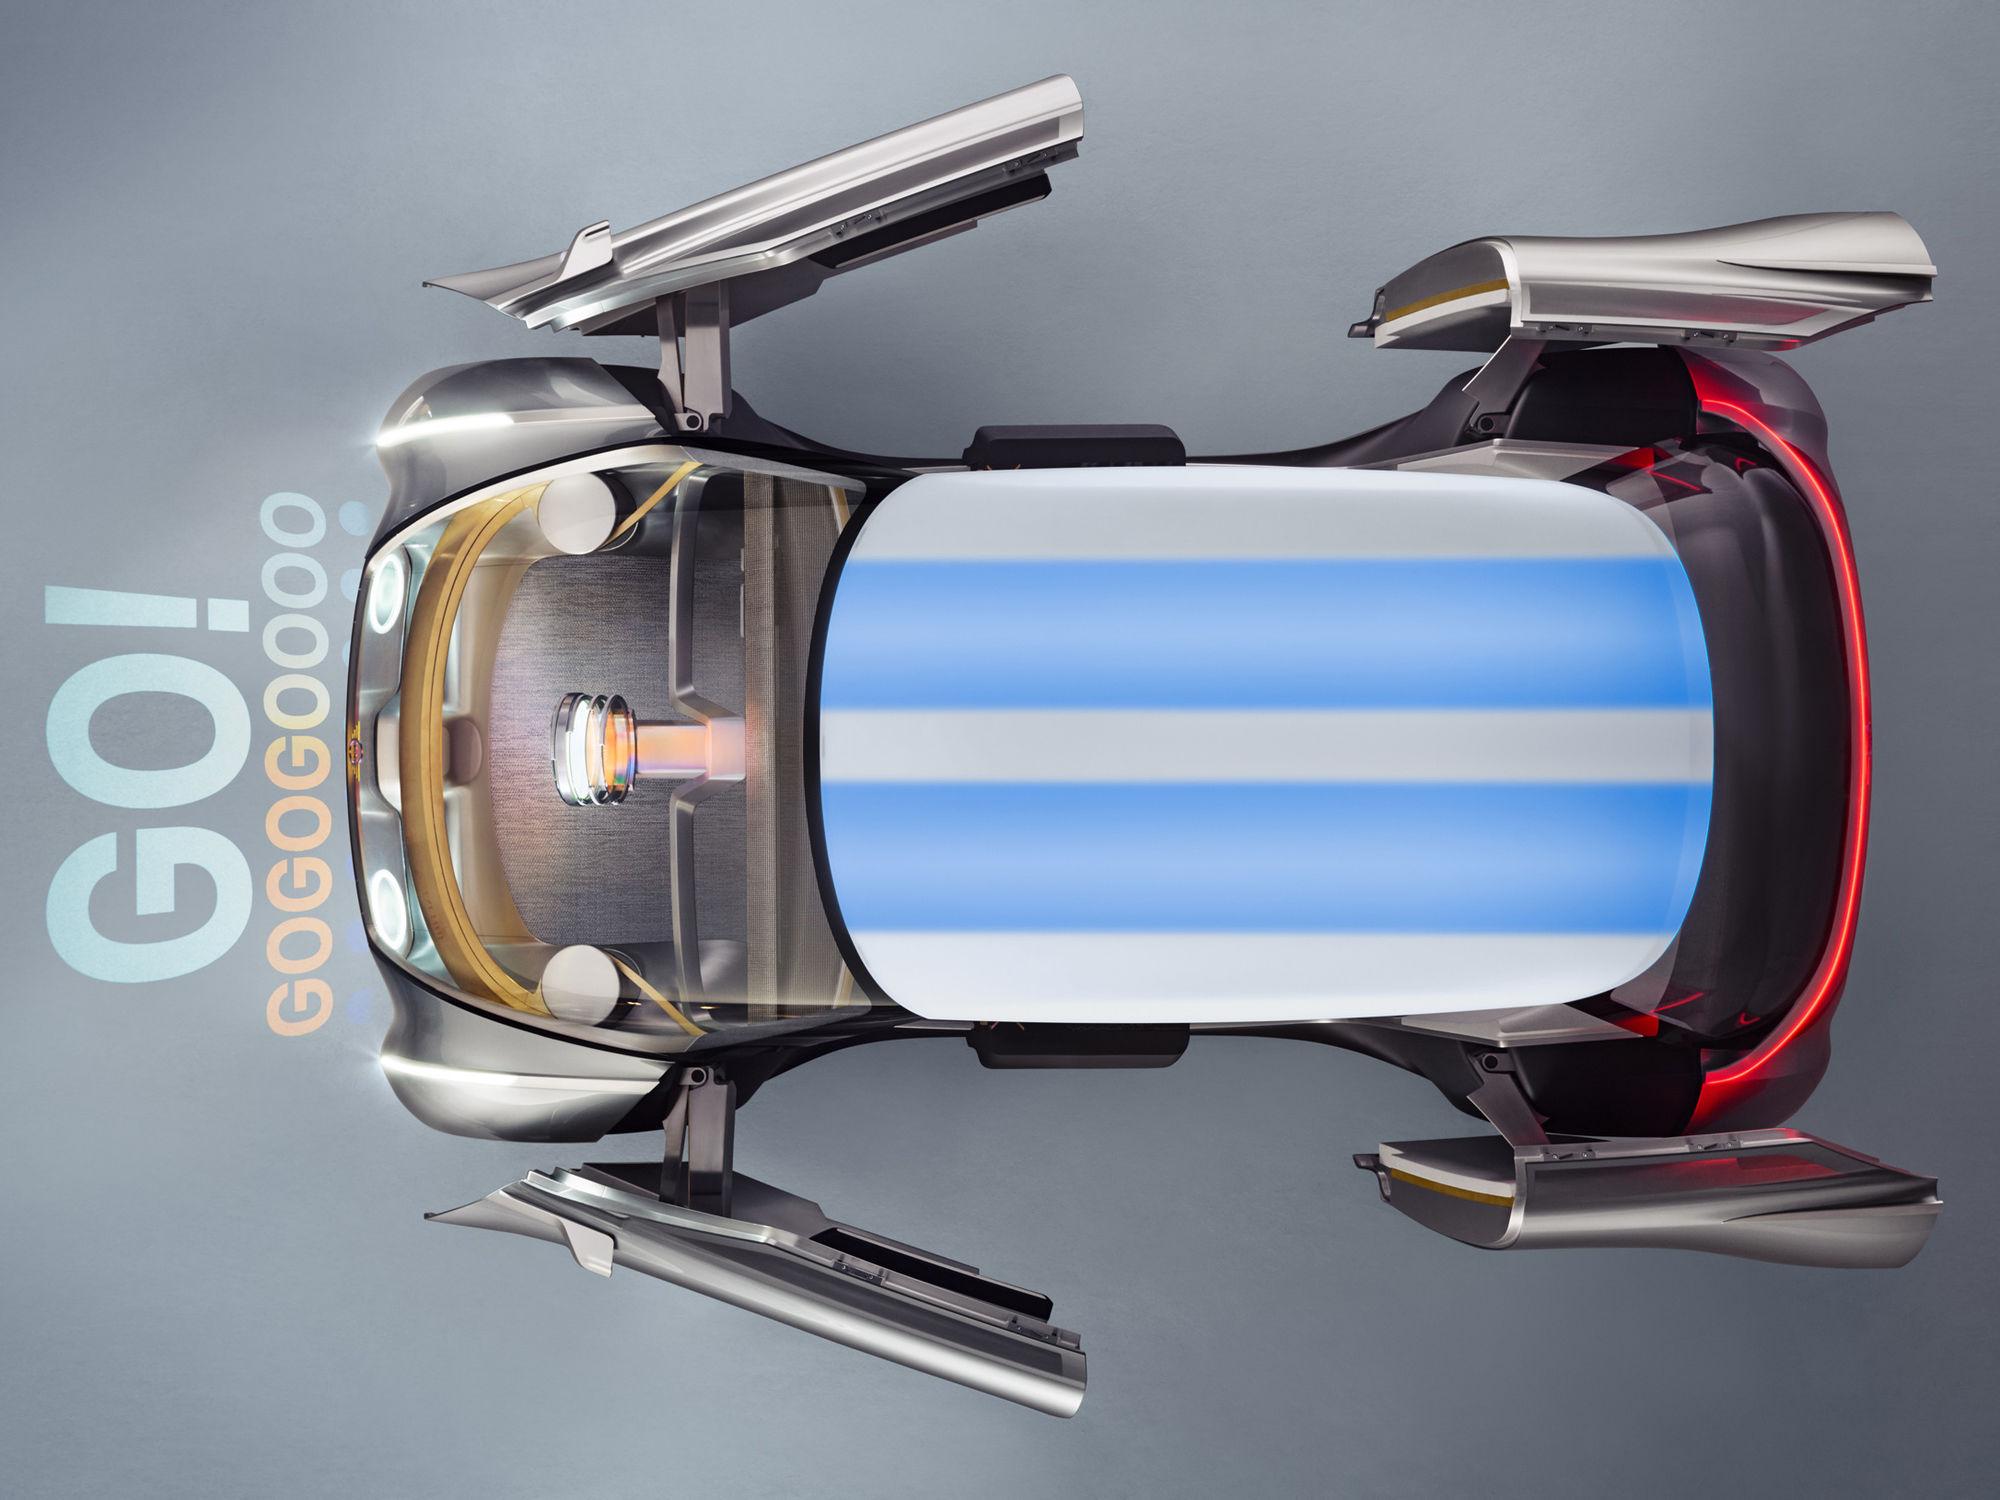 Studio Amos Fricke: The MINI VISION NEXT100 for BMW.